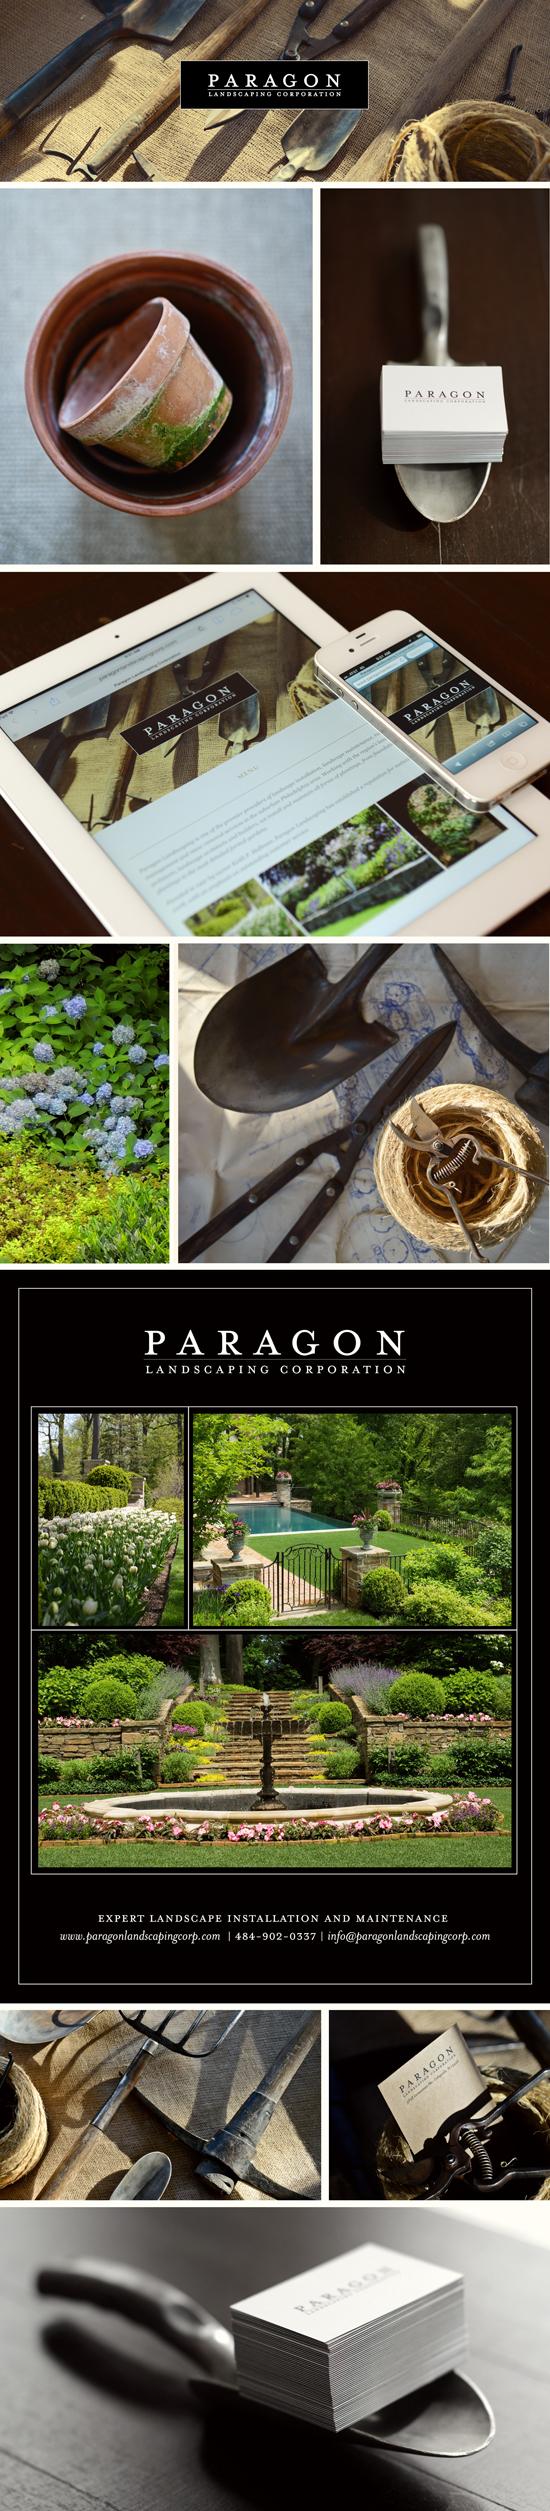 paragonblog2